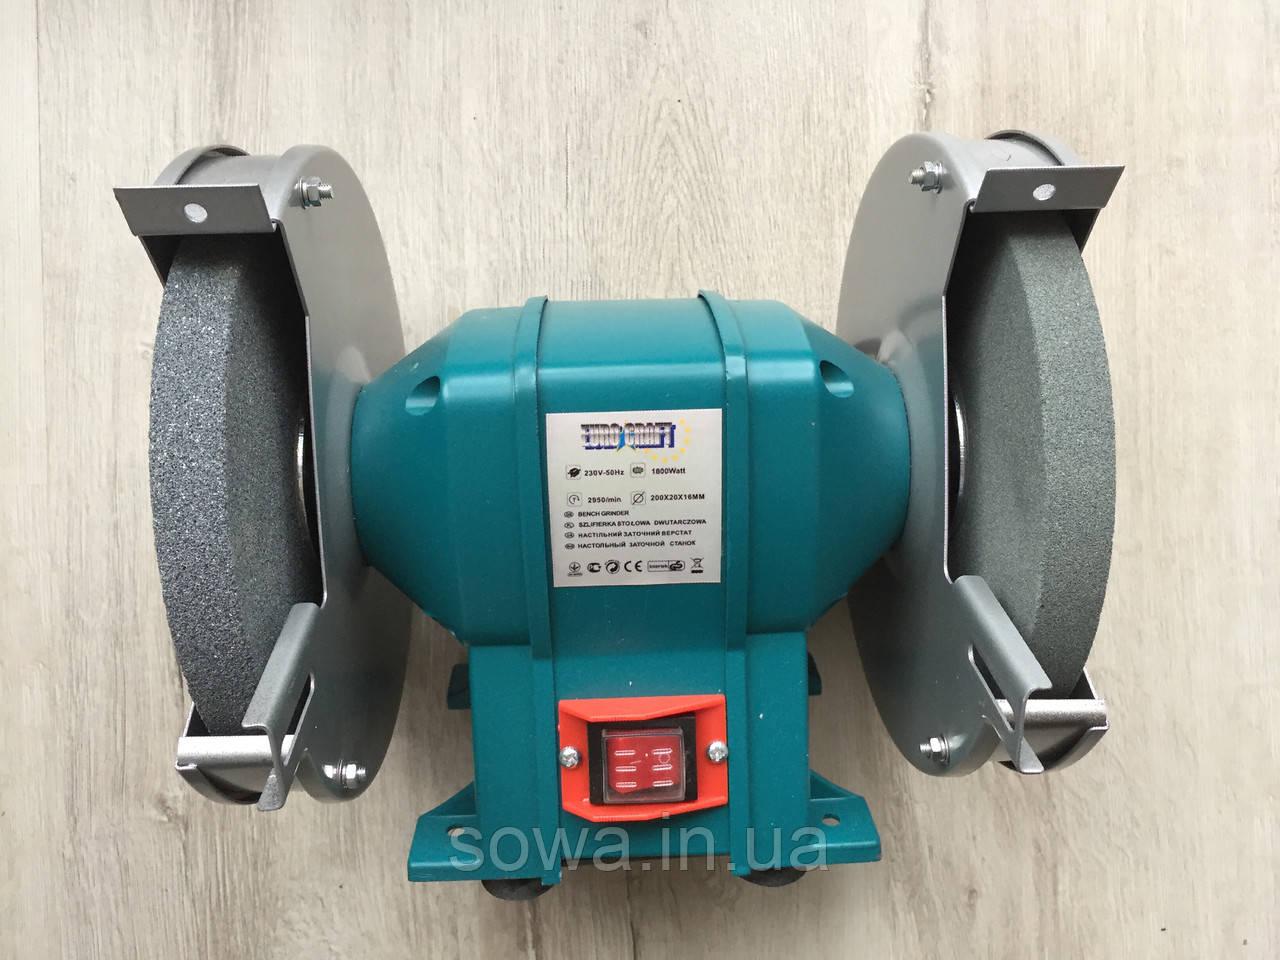 ✔️ Точильний верстат Euro Craft BG 205 / 1800W